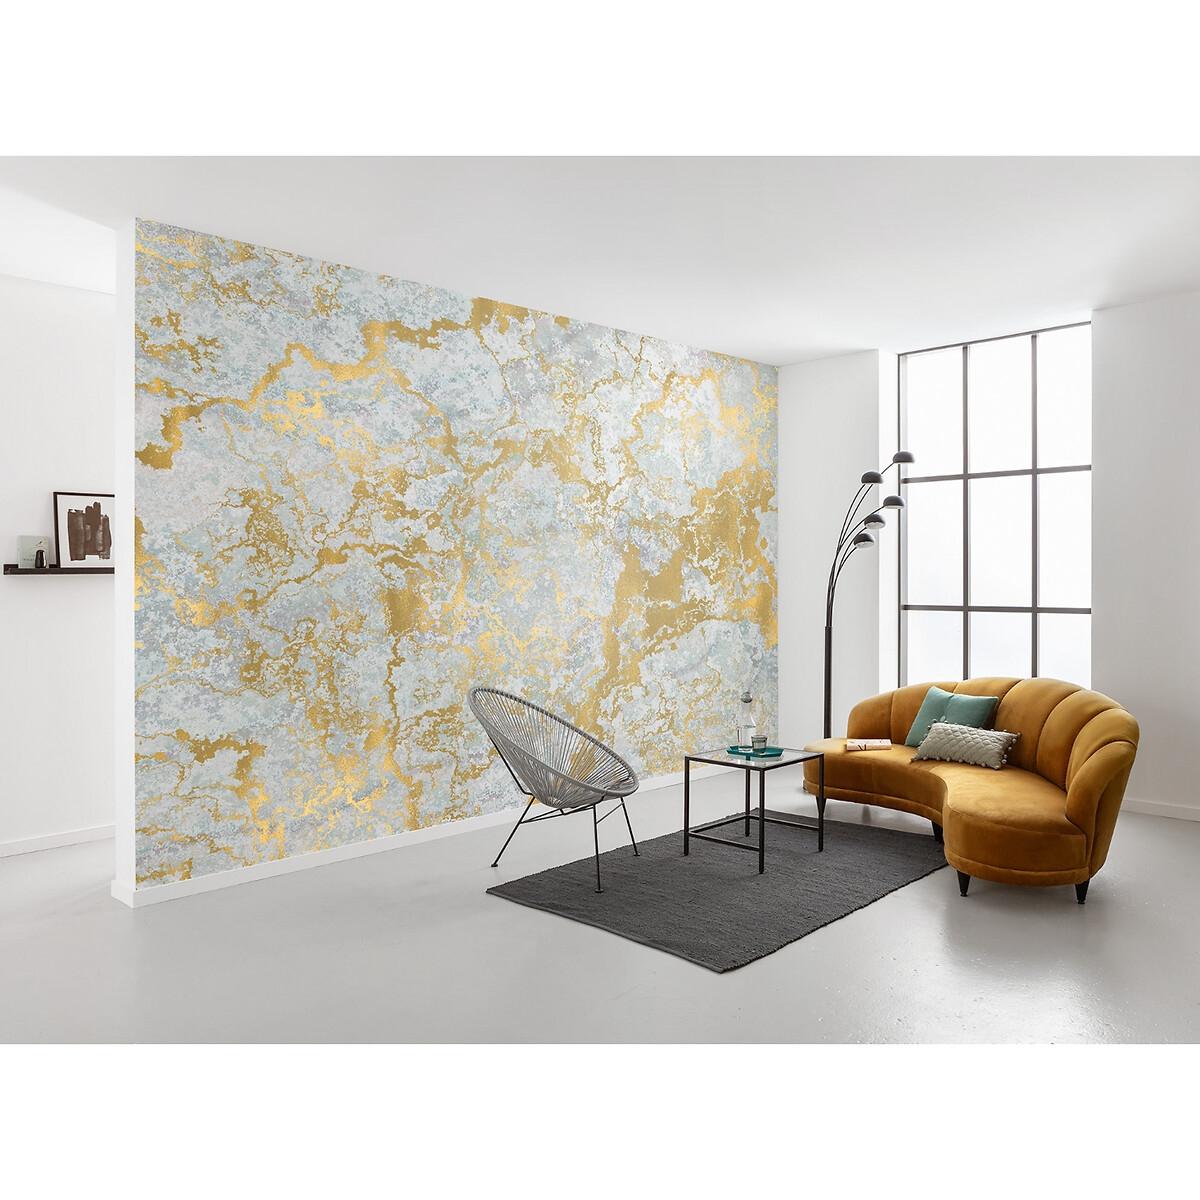 INTERELIFE - Interelife Papel de parede foto mural Marbelous, da Interelife